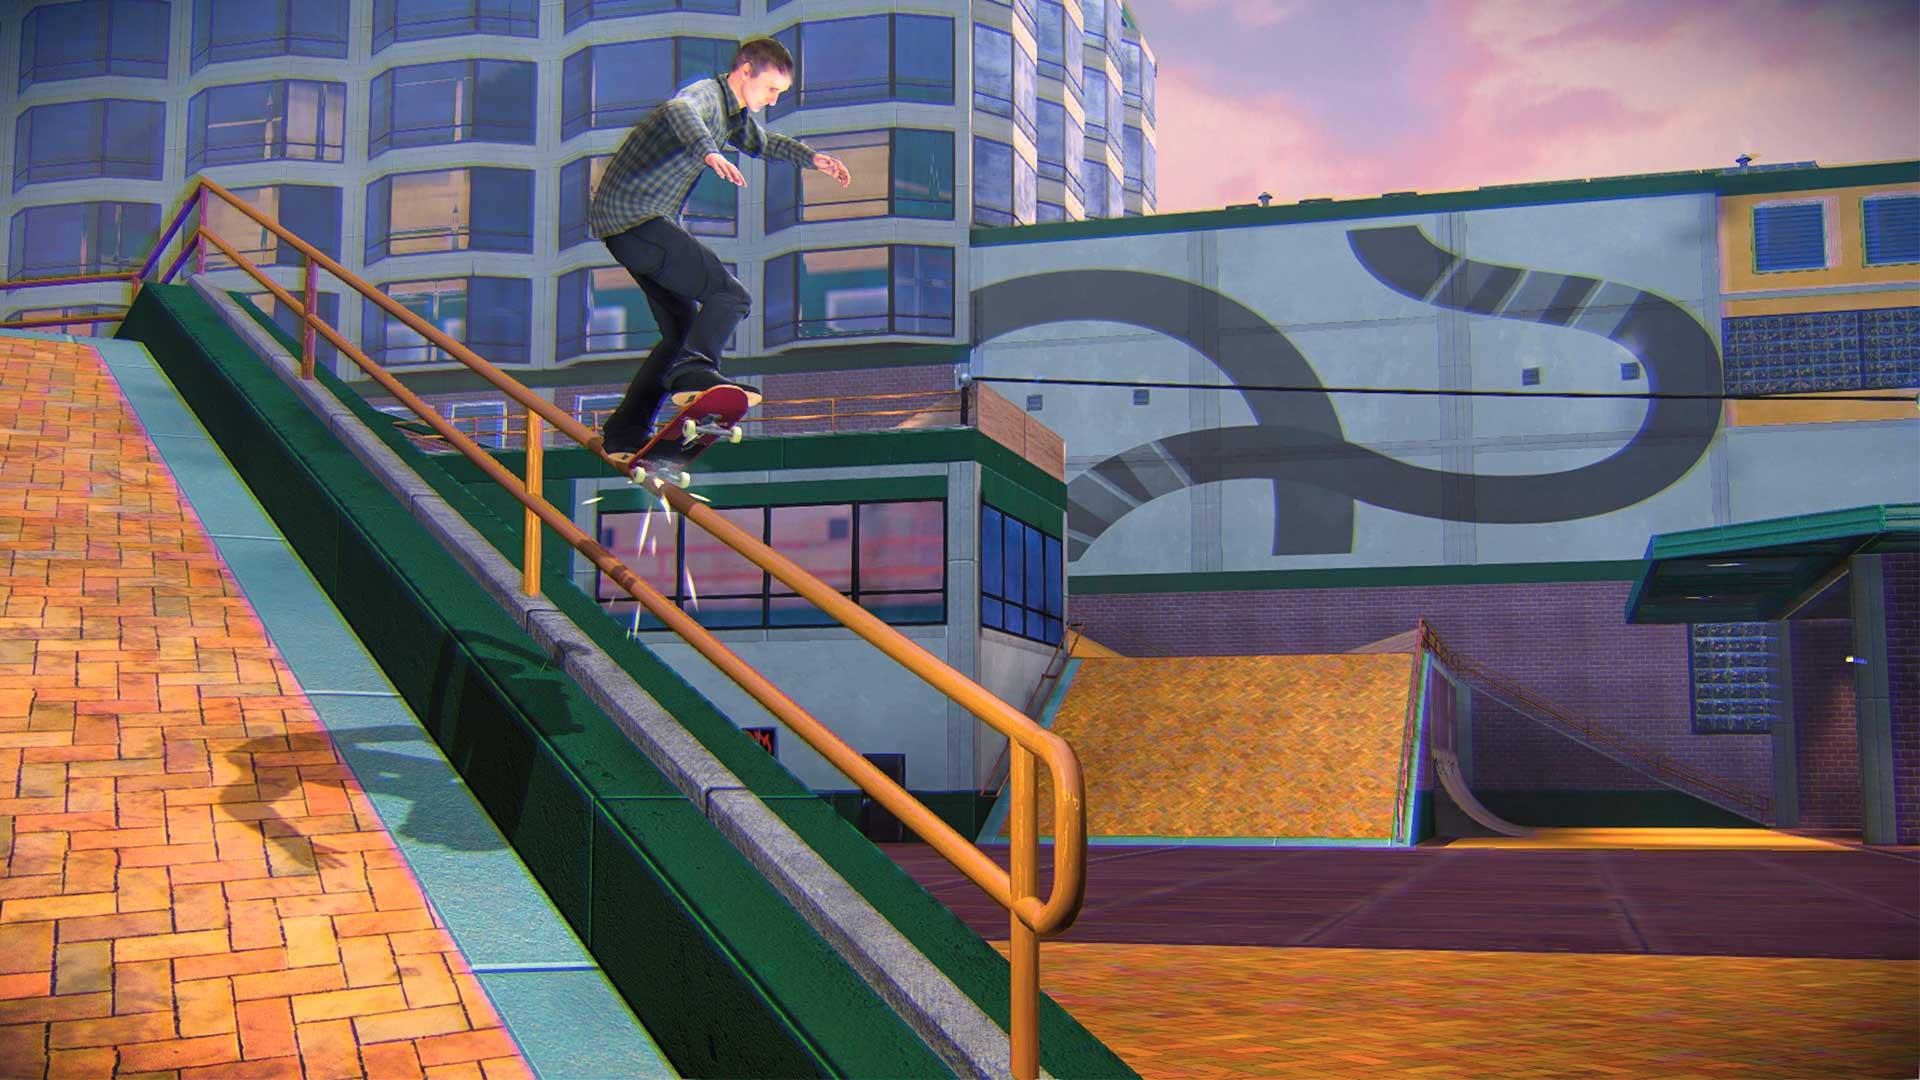 Tony Hawk's Pro Skater 5 - that's a big patch